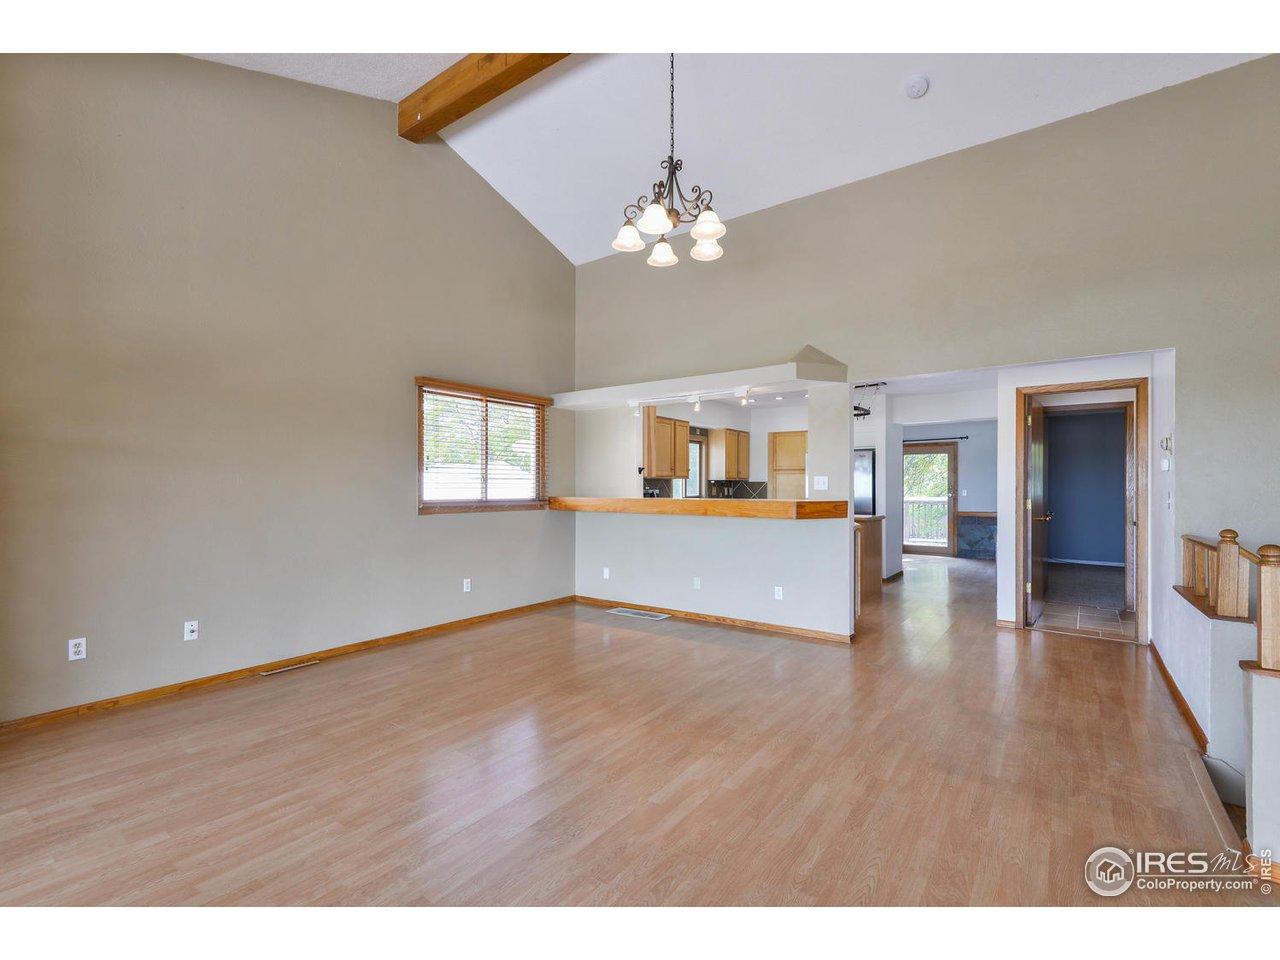 Durable laminate floors